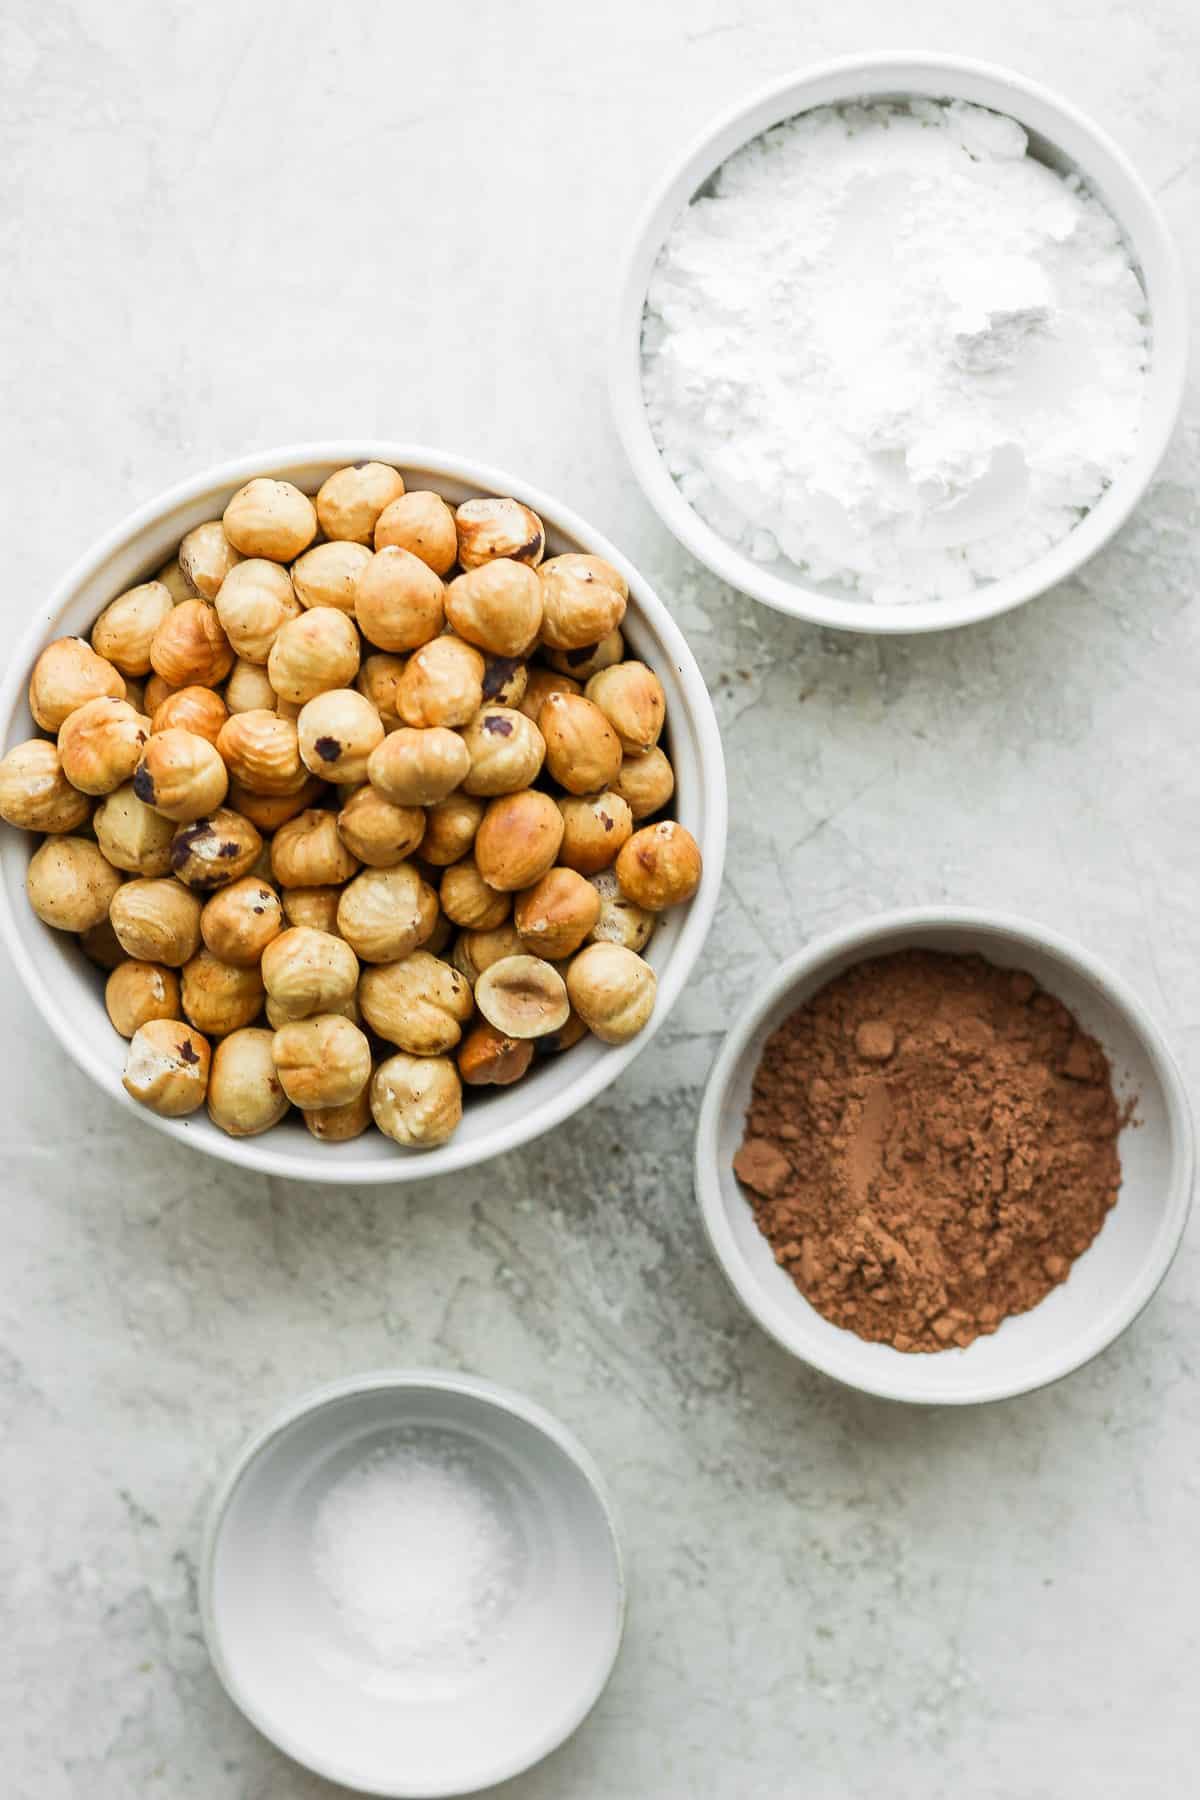 4 ingredients to make the recipe